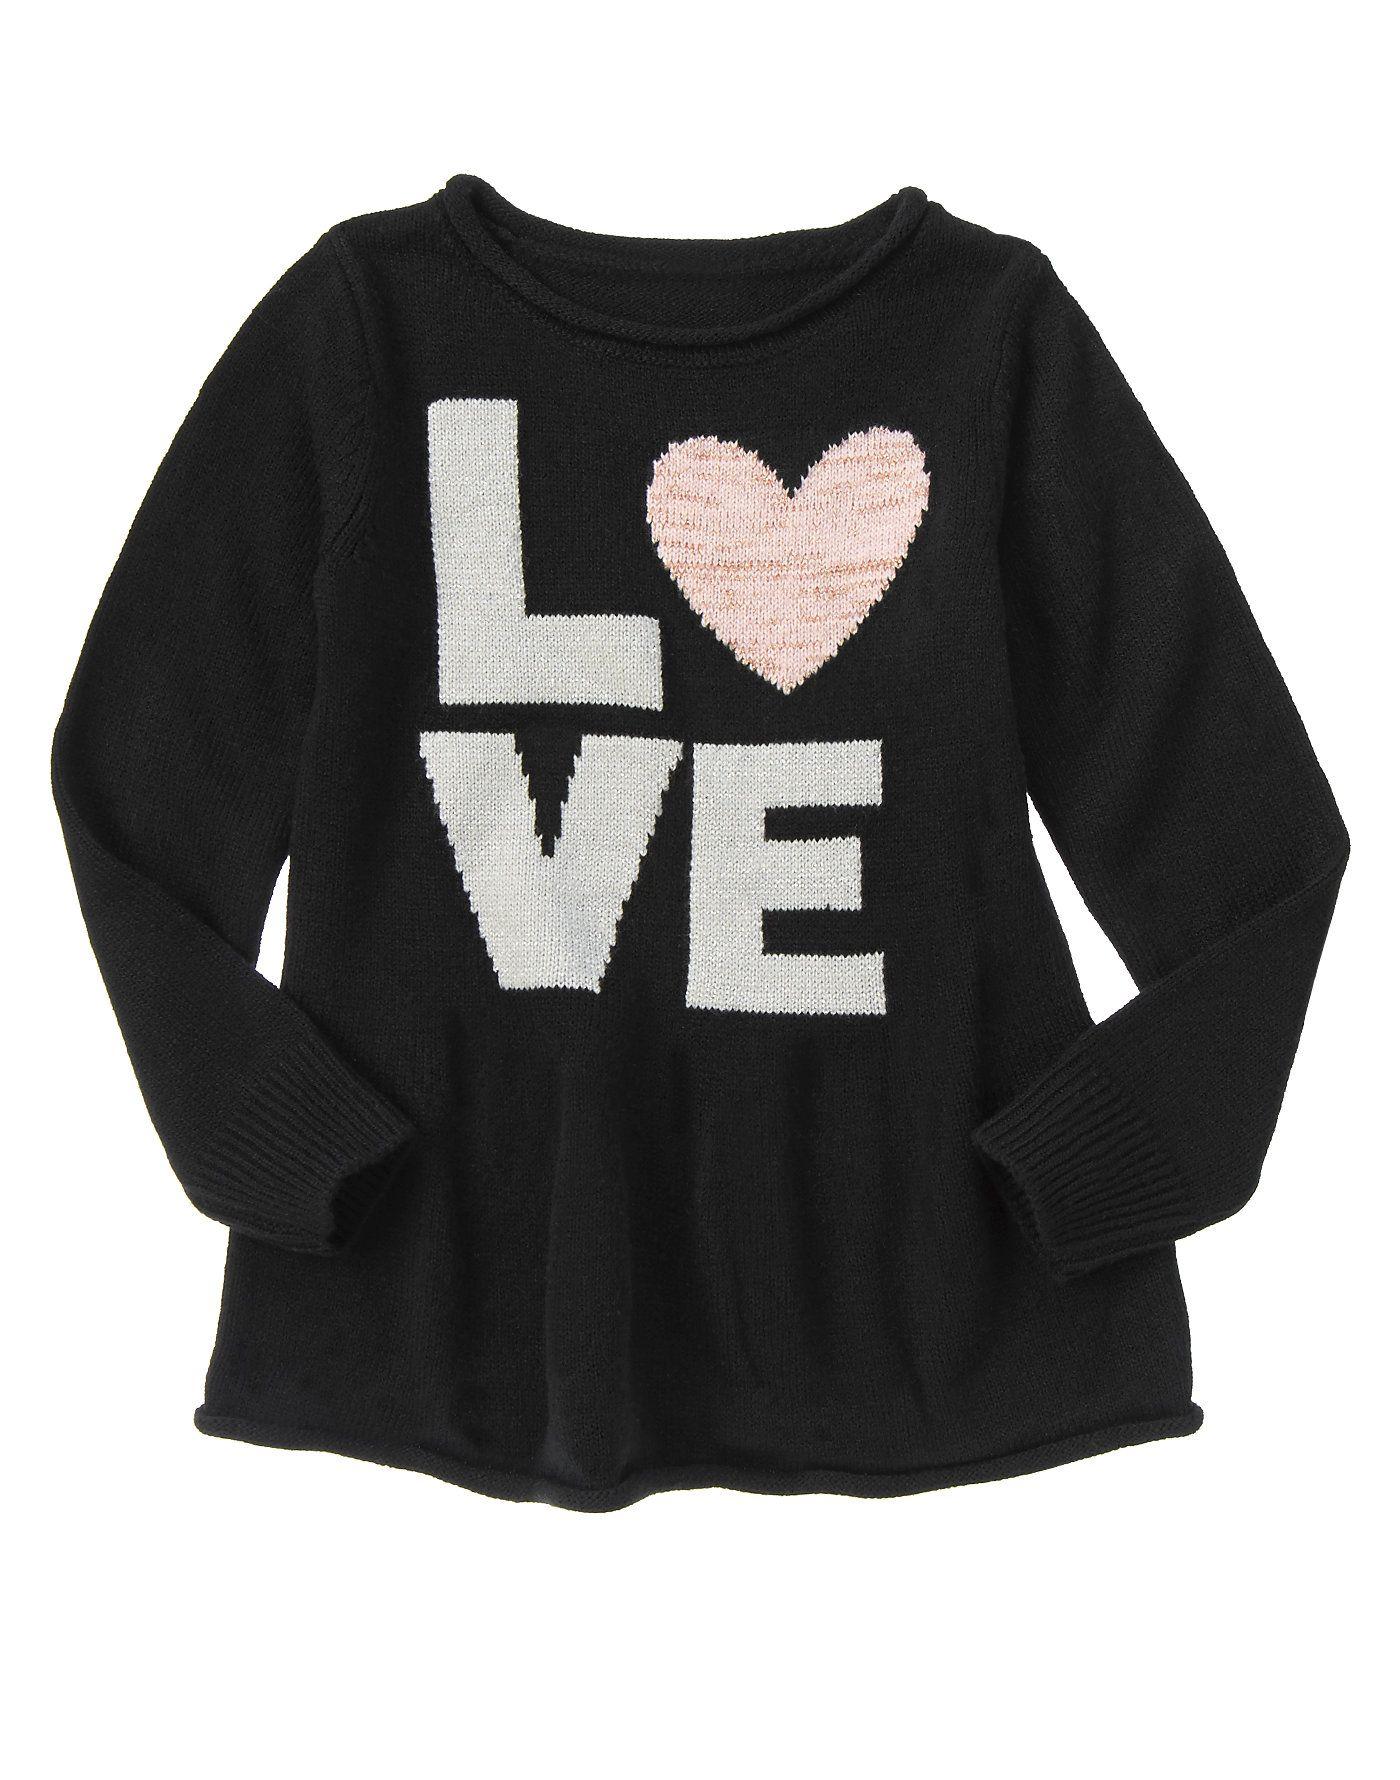 Love Peplum Sweater at Crazy 8